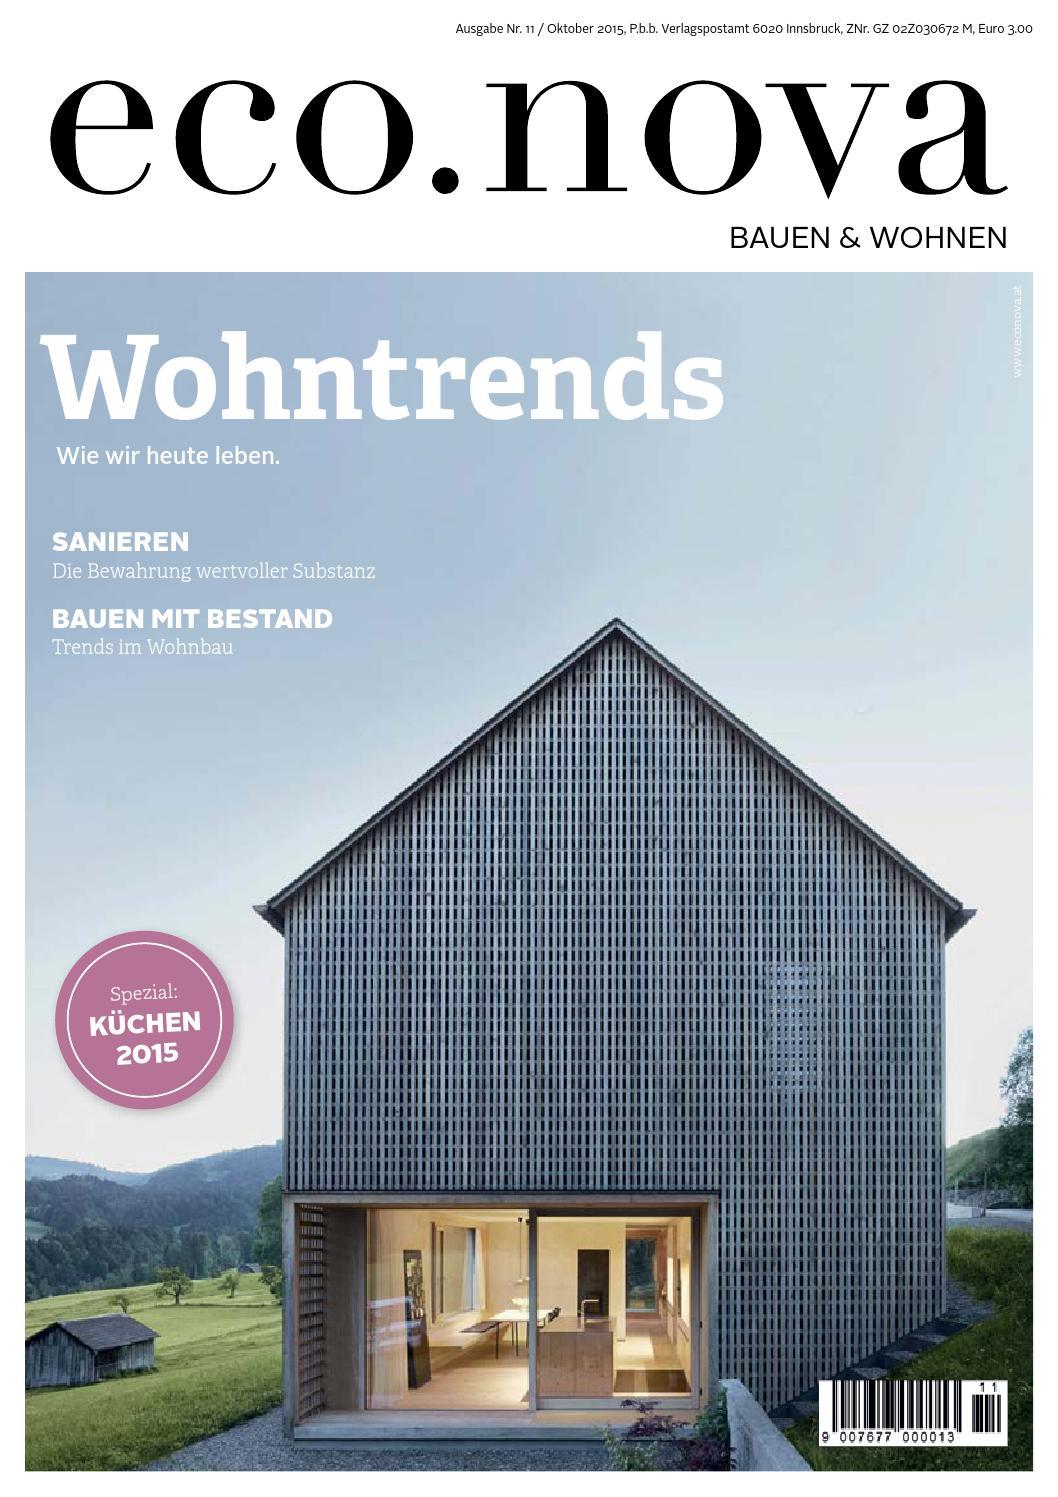 eco.nova SPEZIAL Bauen & Wohnen 2015 by eco.nova verlags gmbh - issuu